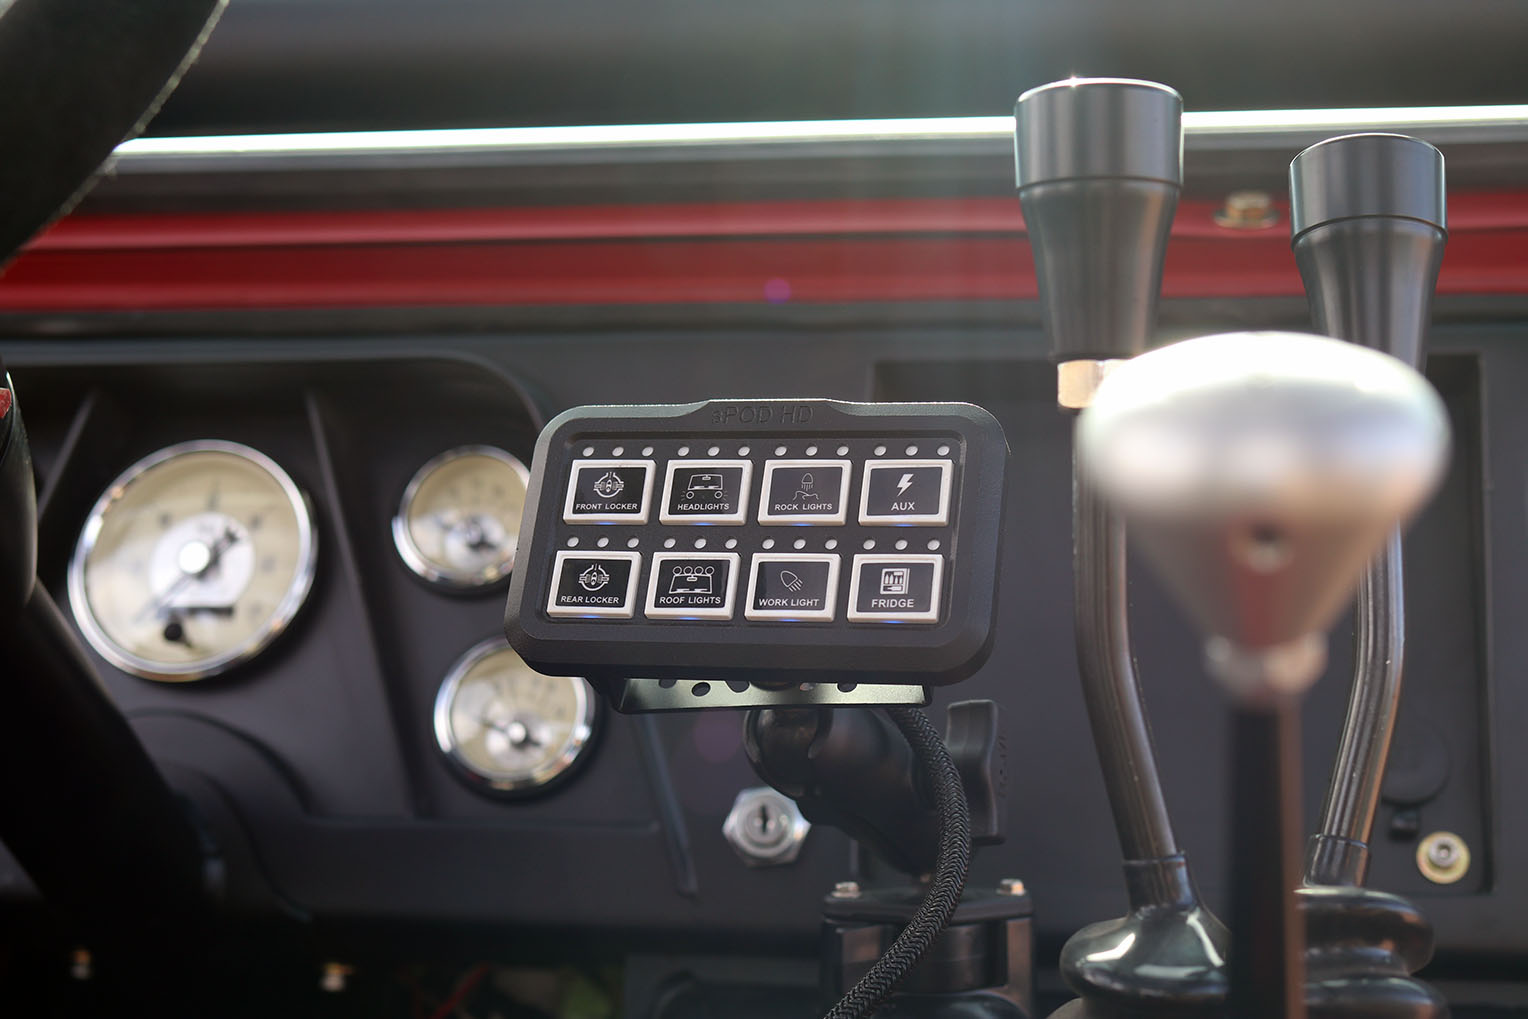 Custom Reconditioned 1973 Jeep Commando Build - Image #05